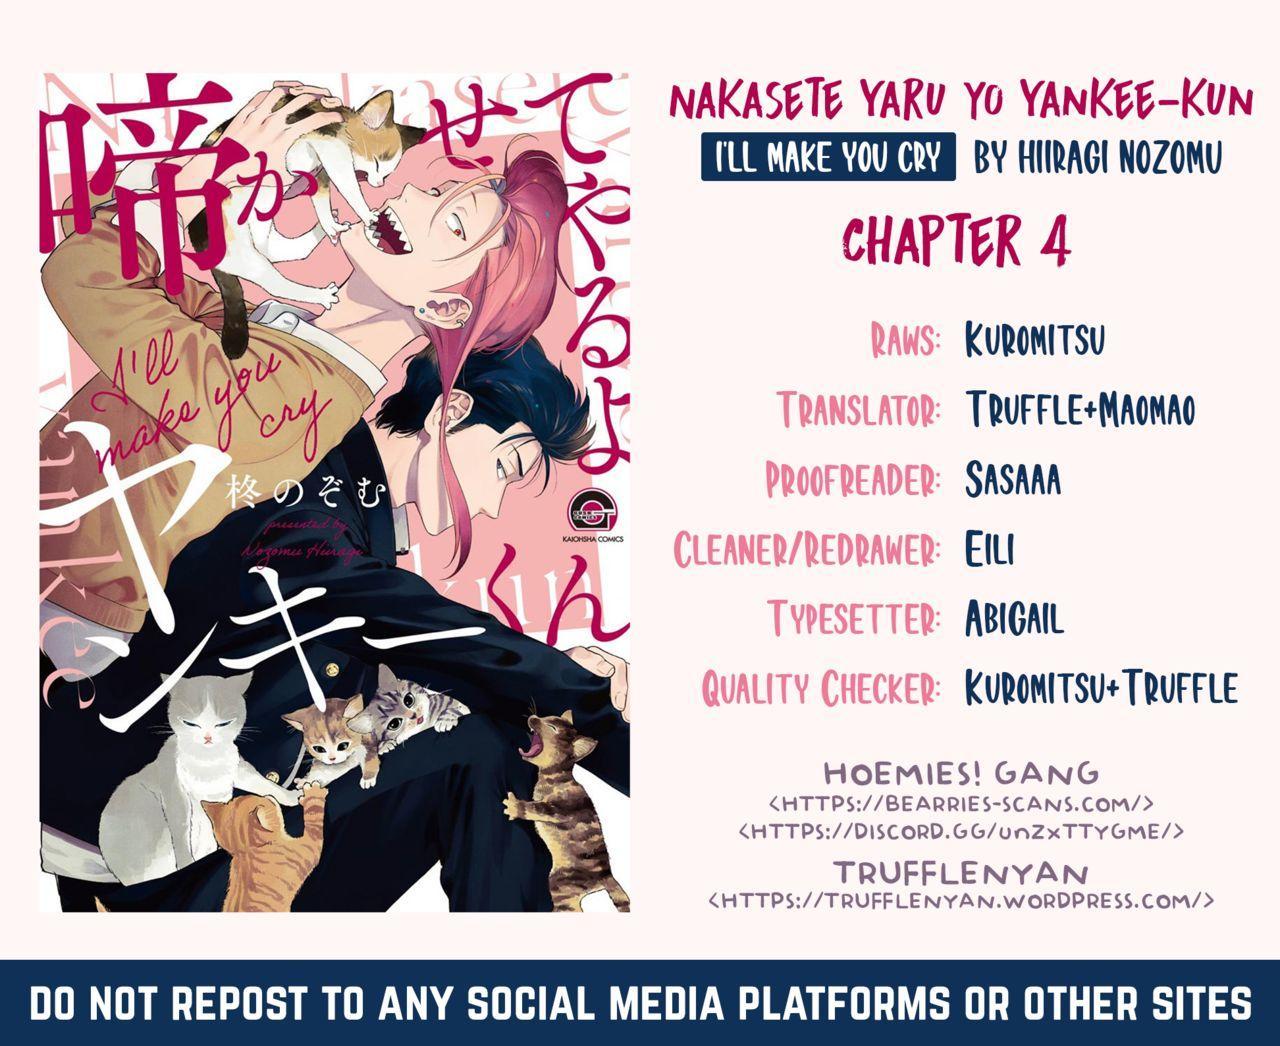 [Hiiragi Nozomu] Nakasete Yaru yo Yankee-kun   I'll Make You Cry Ch. 1-5 + Extras [English] [Digital] 121